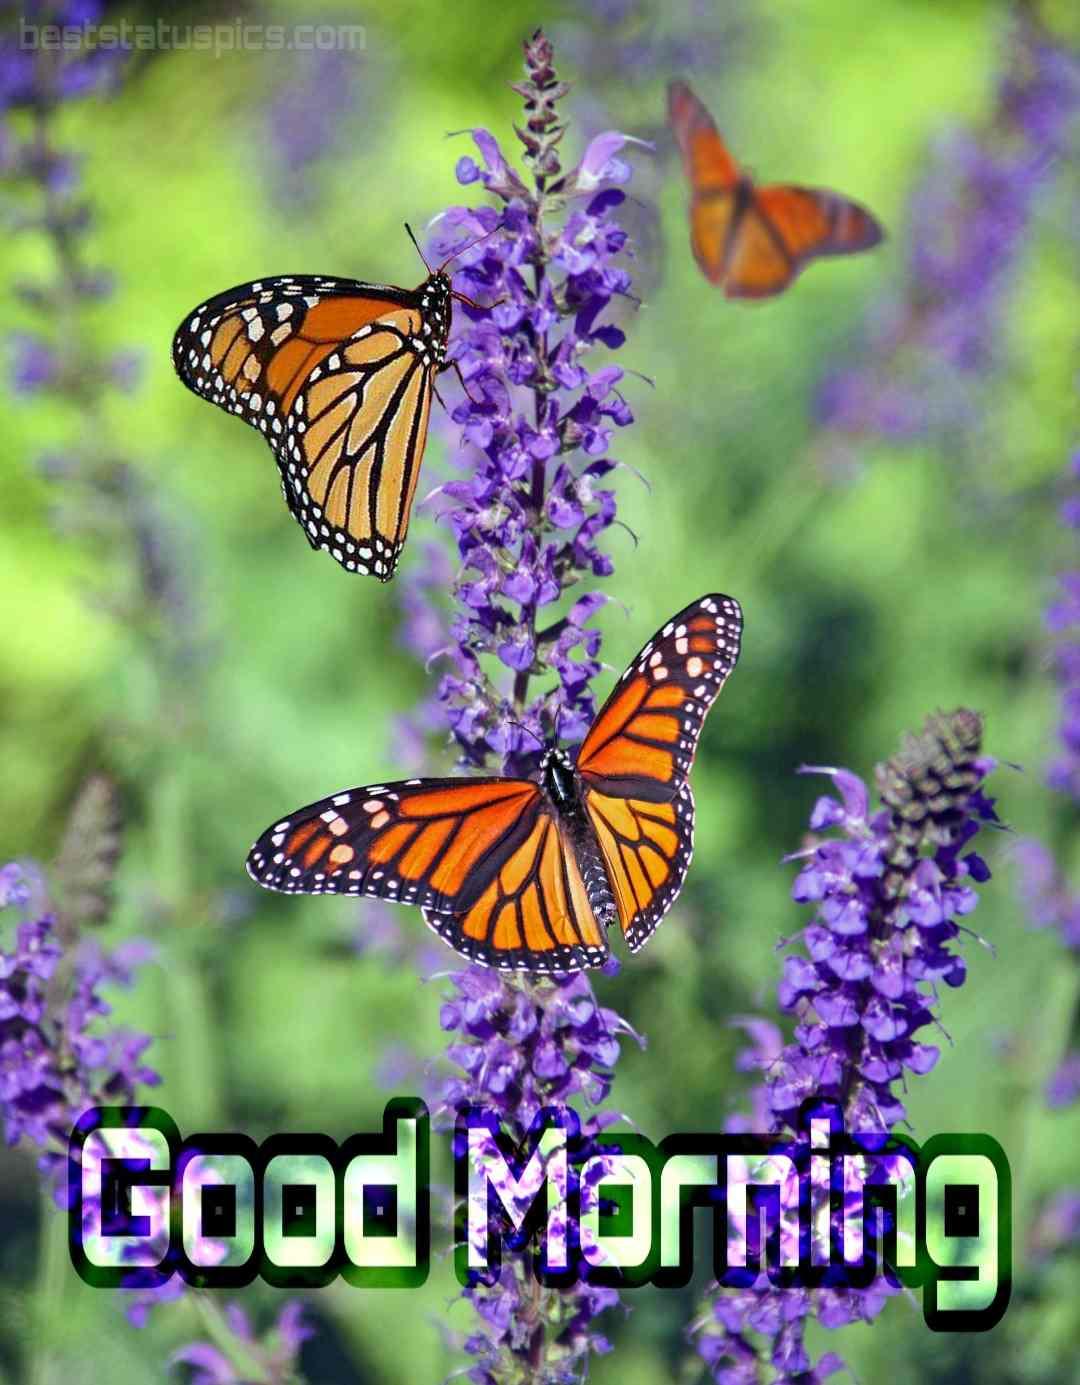 911 Beautiful Good Morning Nature Hd Images Pics 2020 Best Status Pics